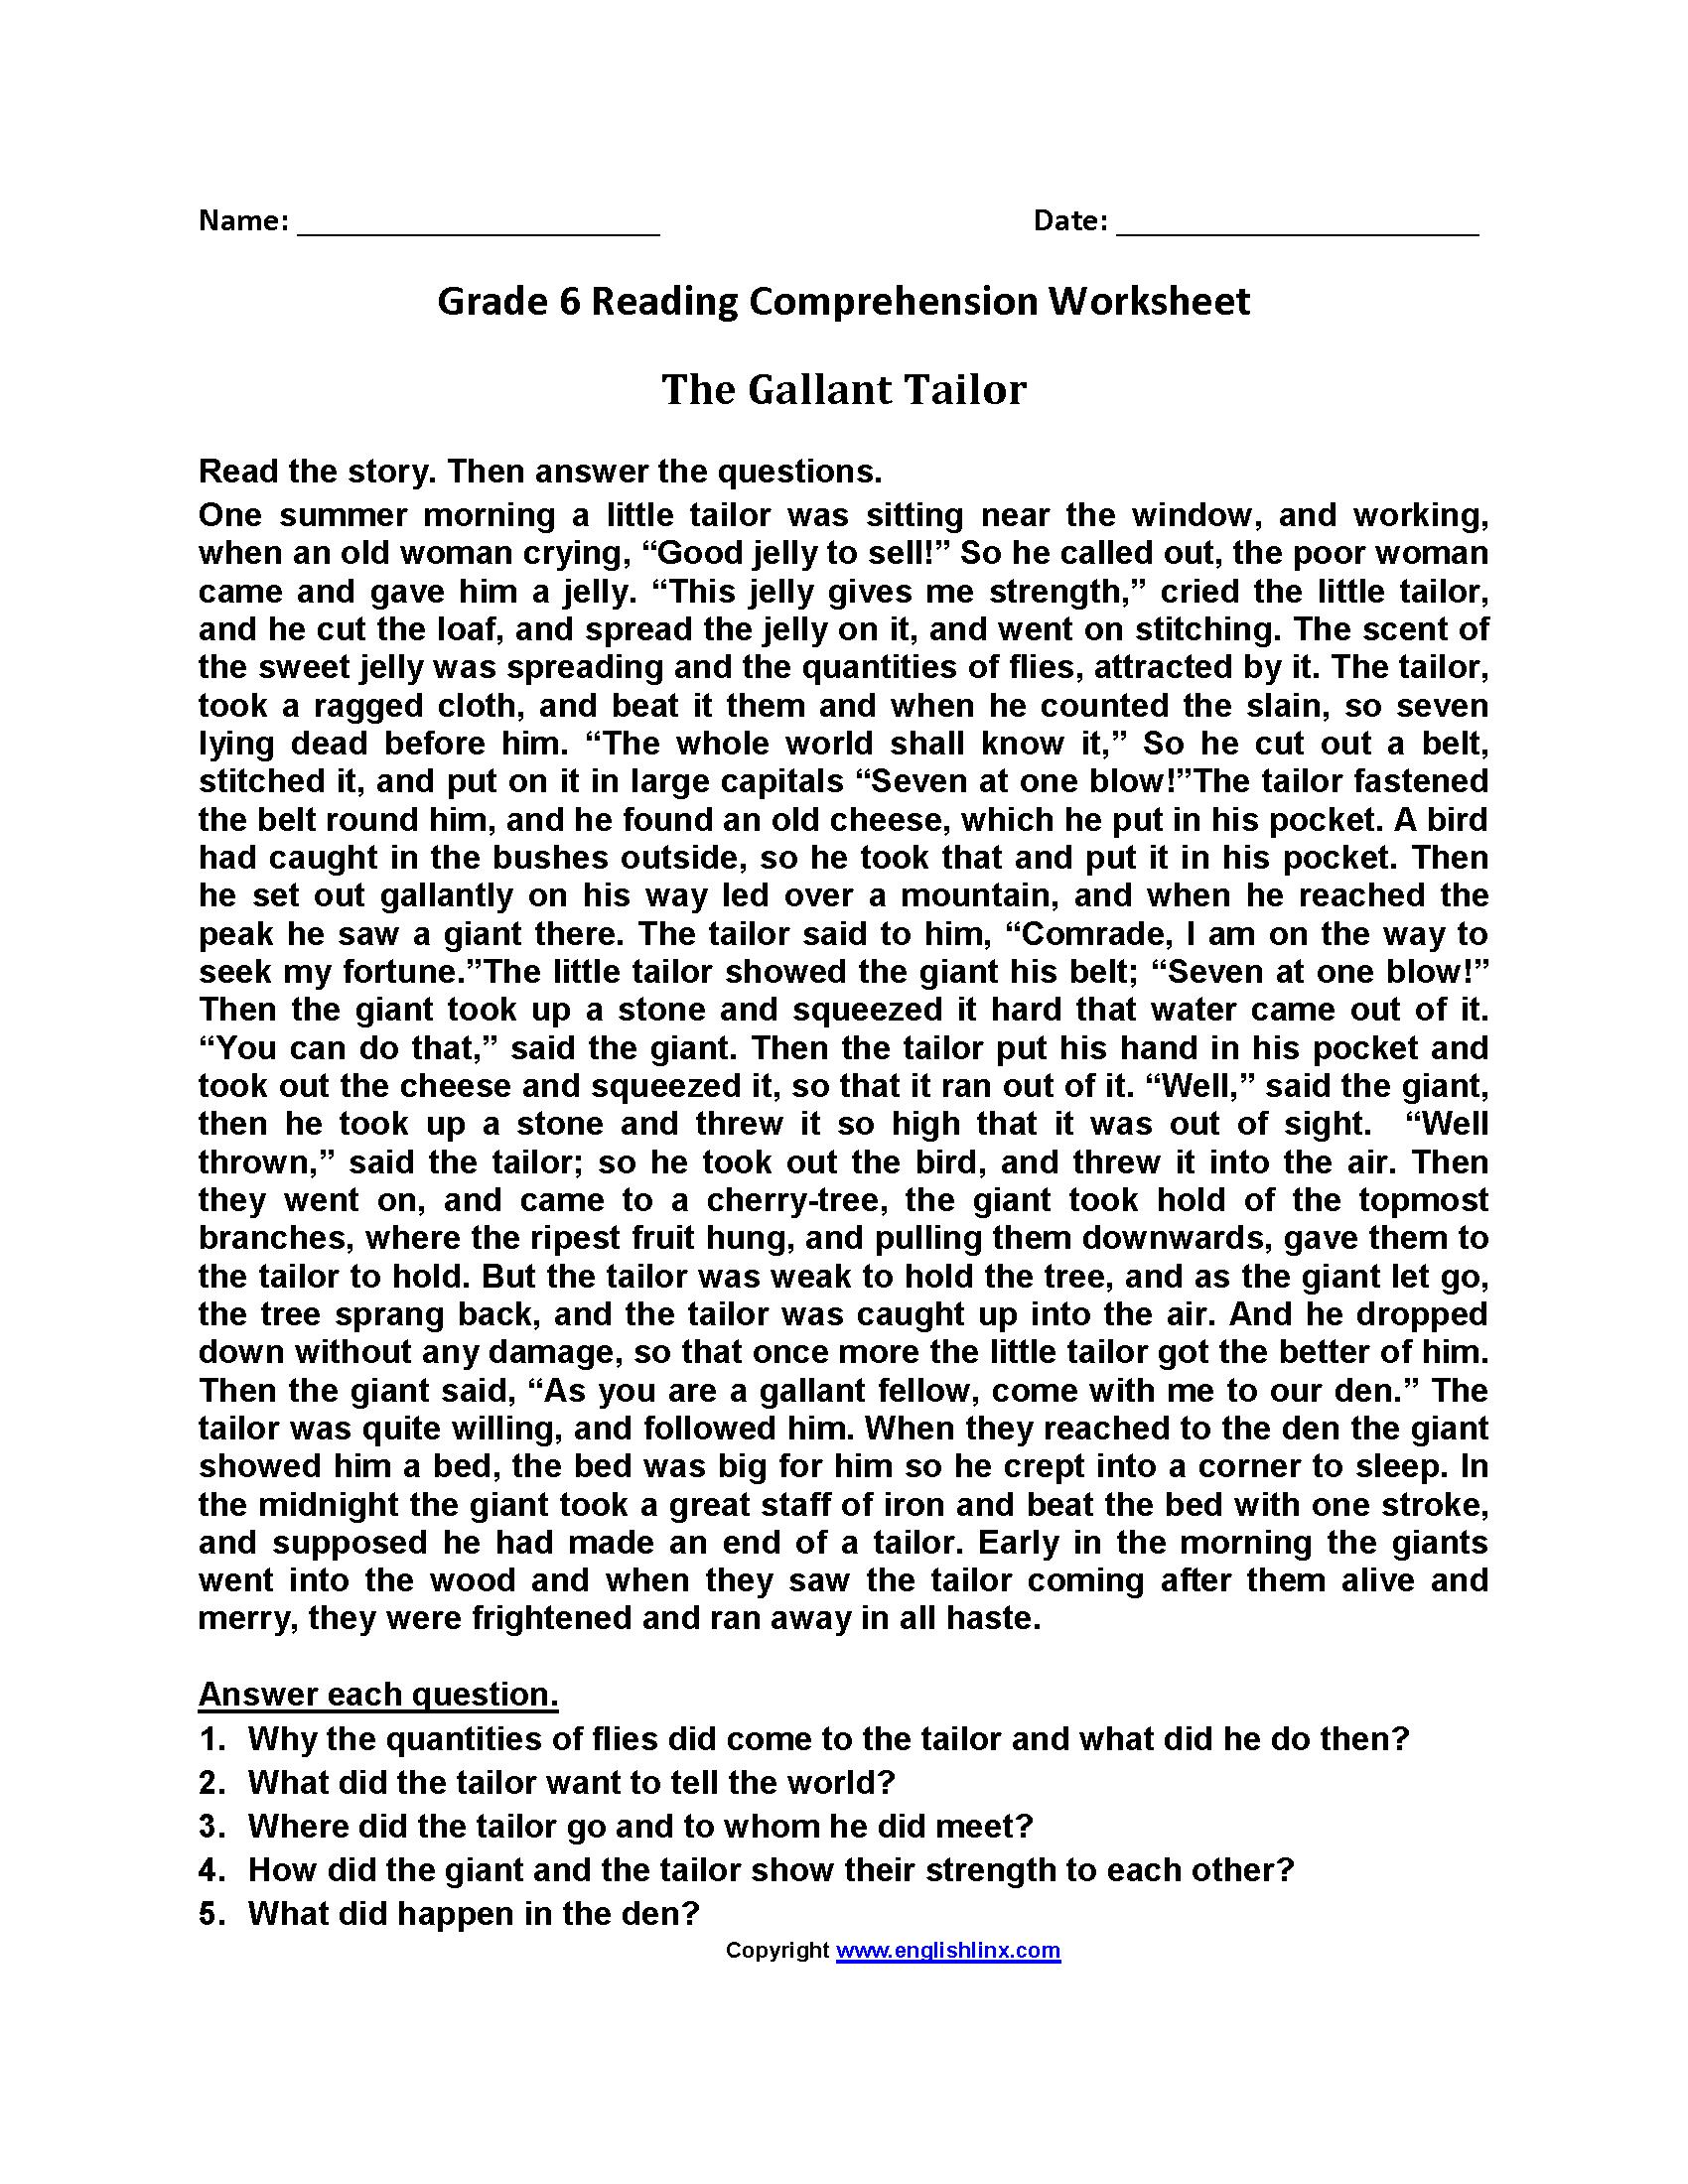 medium resolution of The Gallant Tailor\u003cbr\u003eSixth Grade Reading Worksheets   Reading  comprehension worksheets